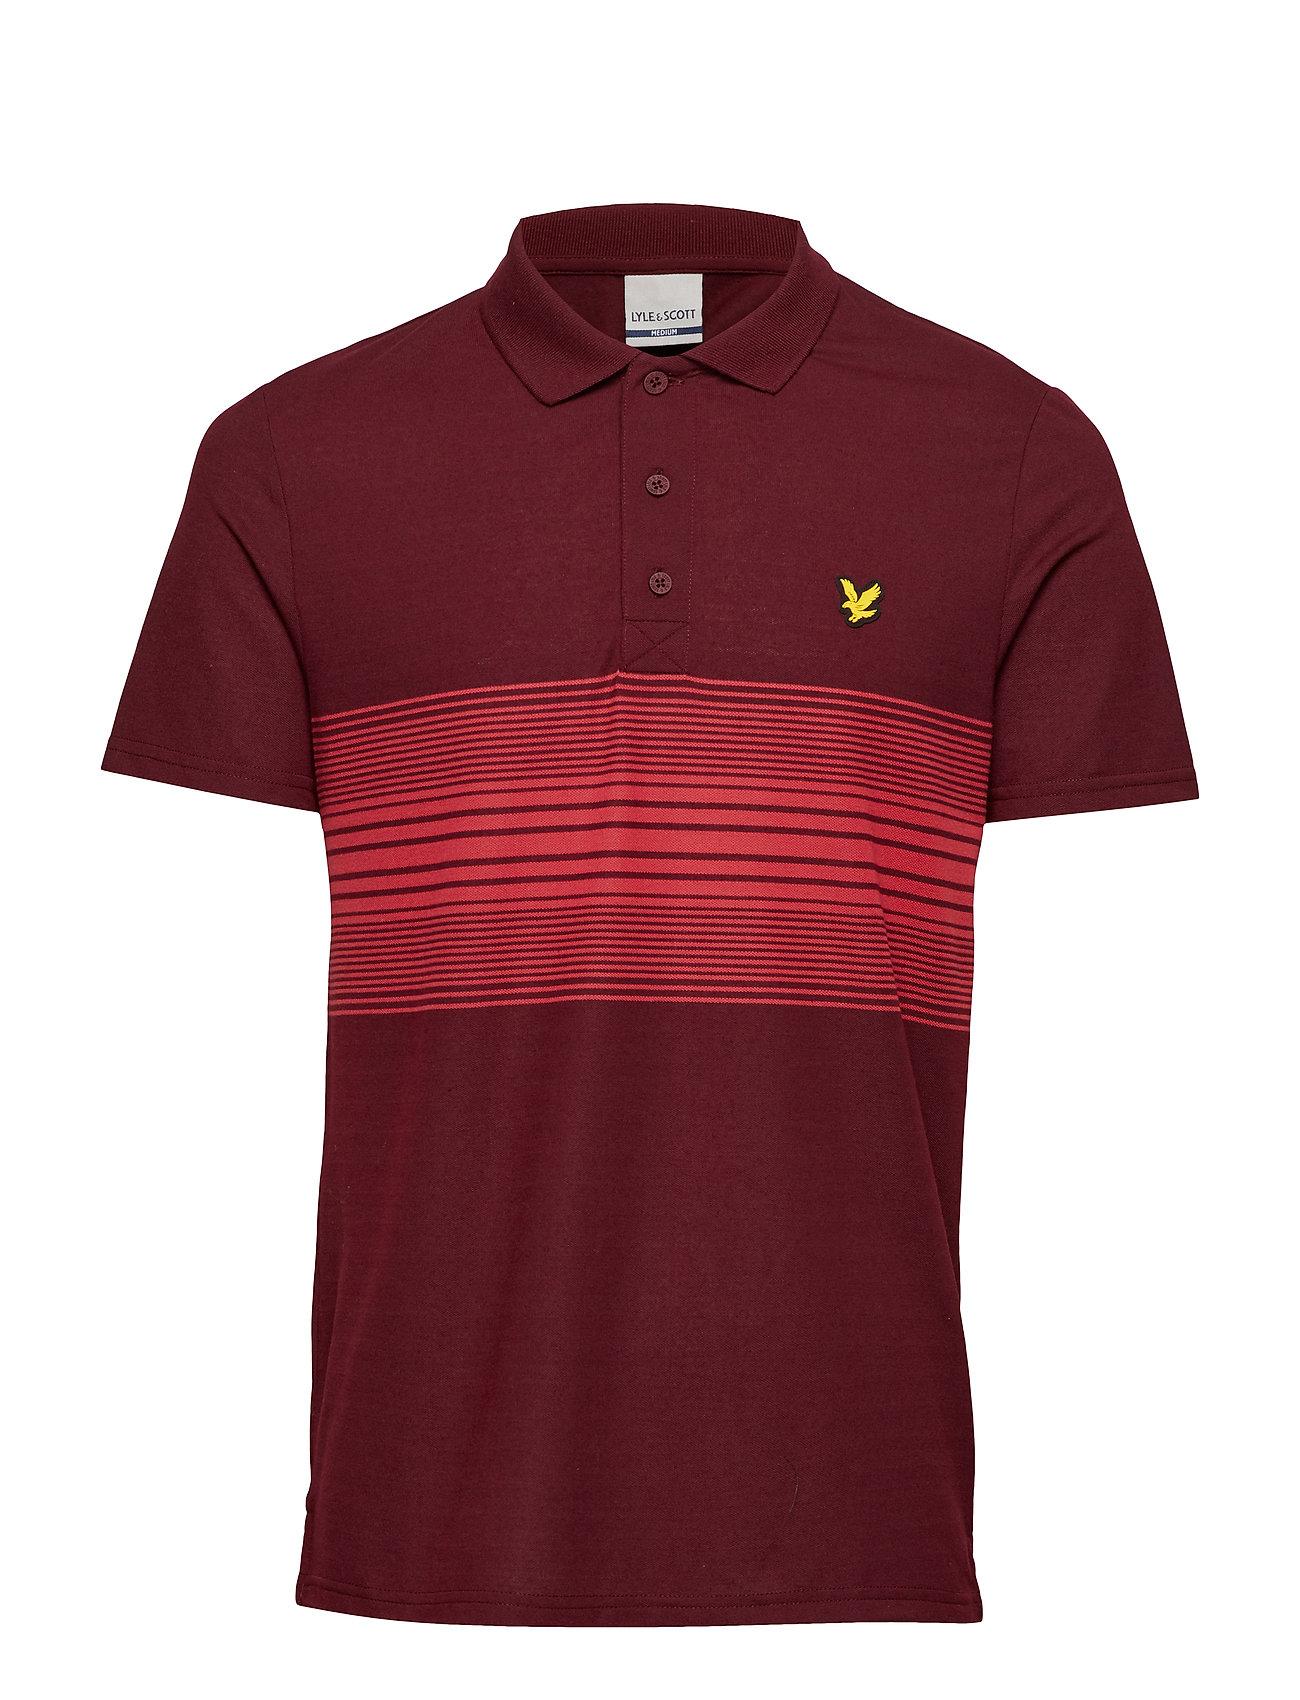 46fe472b1 Cheap Lyle And Scott Golf Polo Shirts   Azərbaycan Dillər Universiteti